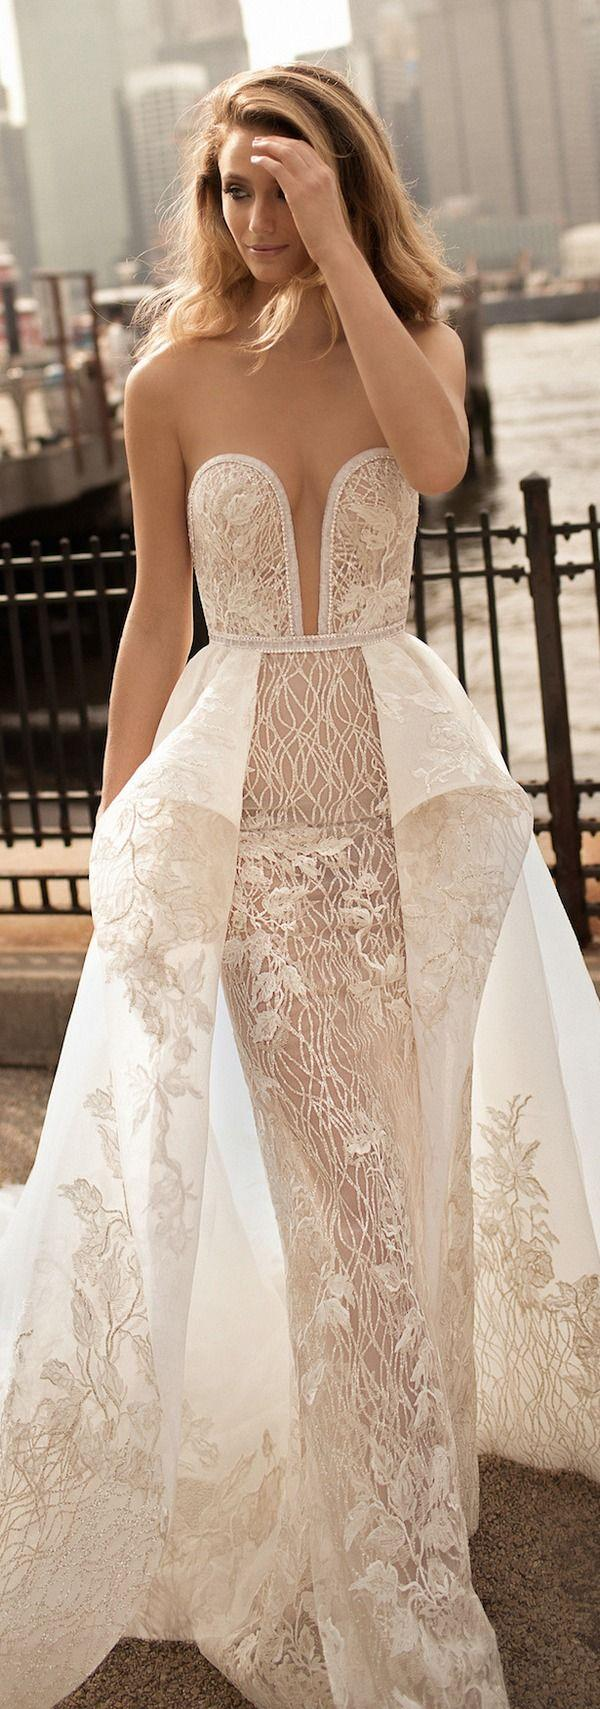 Mariage - Berta Spring Wedding Dresses 2018